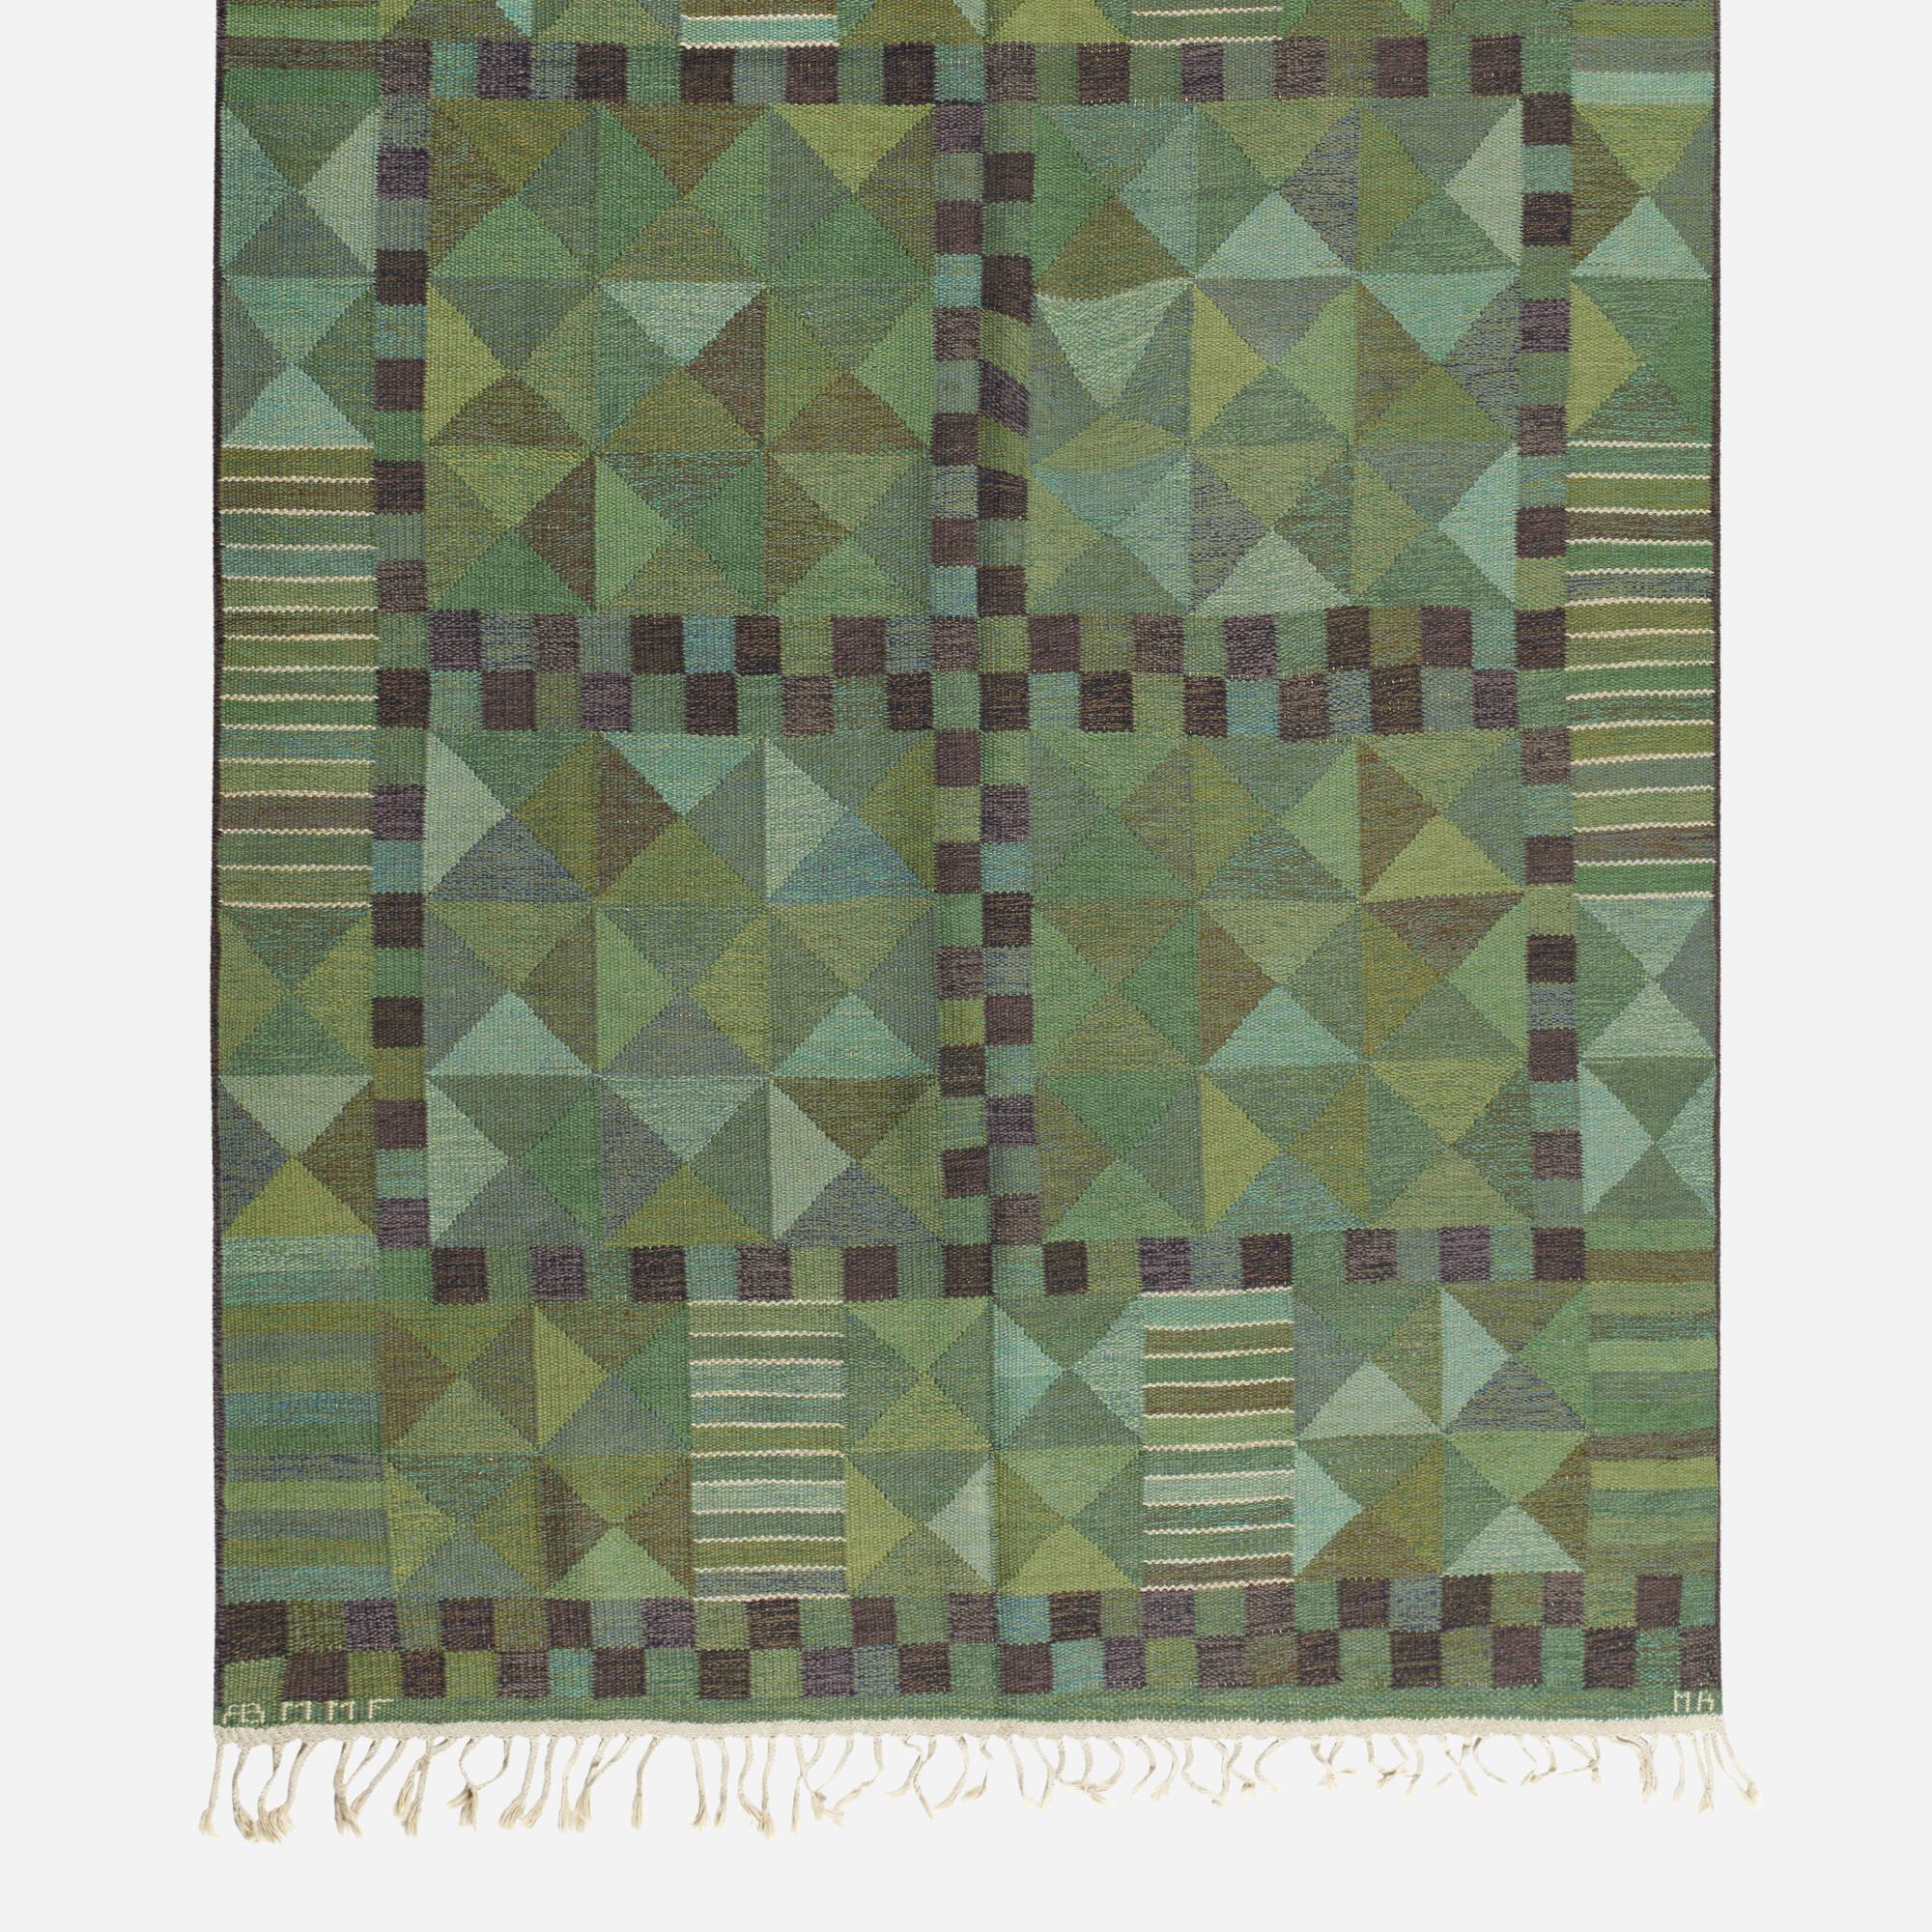 107: Marianne Richter / Rubirosa flatweave carpet (2 of 2)